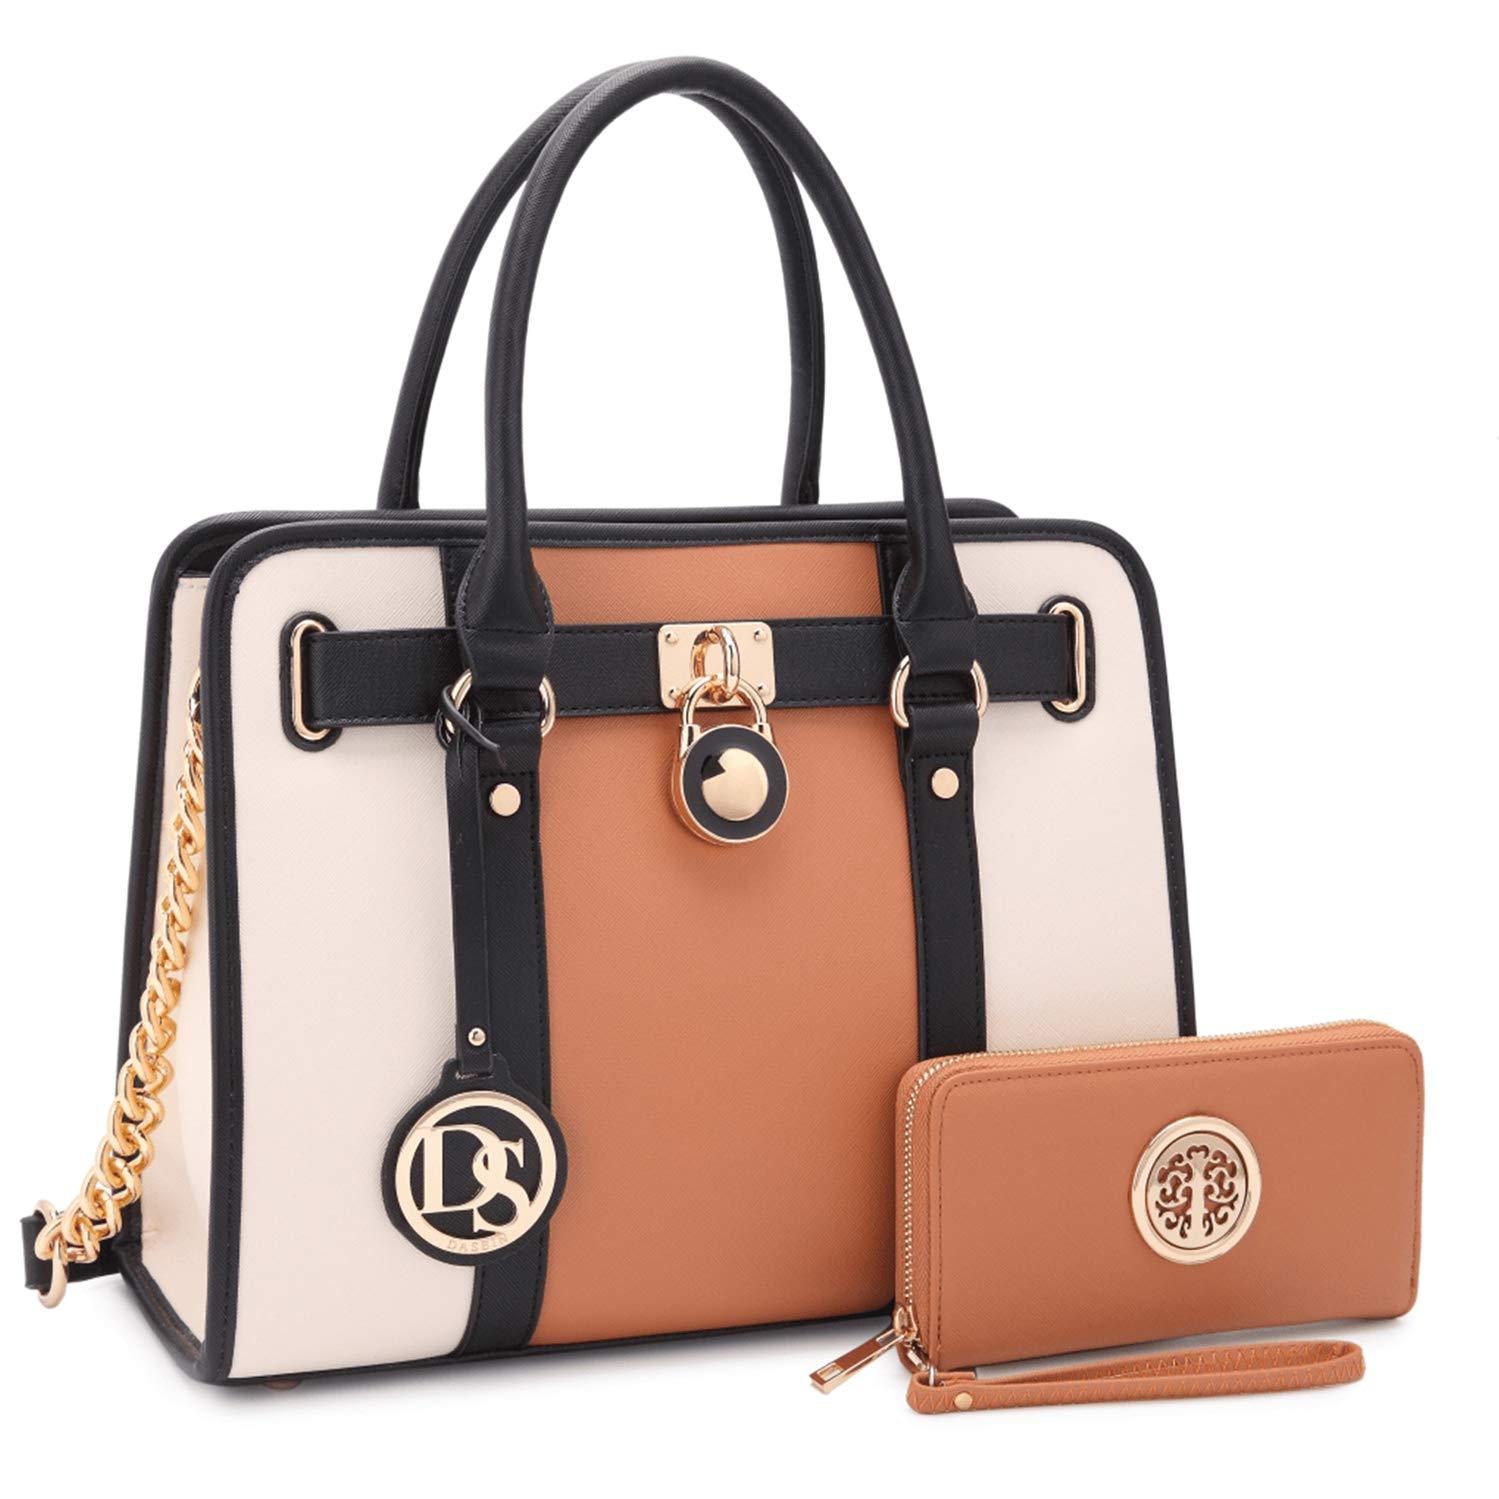 MMK collection Fashion Handbag with coin purse(XL-11) Classic Women Purse Handbag for Women` Signature fashion Designer Purse ~ Perfect Women Satchel Purse (XL-02-7103W-BR/BG) by Marco M. Kerry (Image #1)